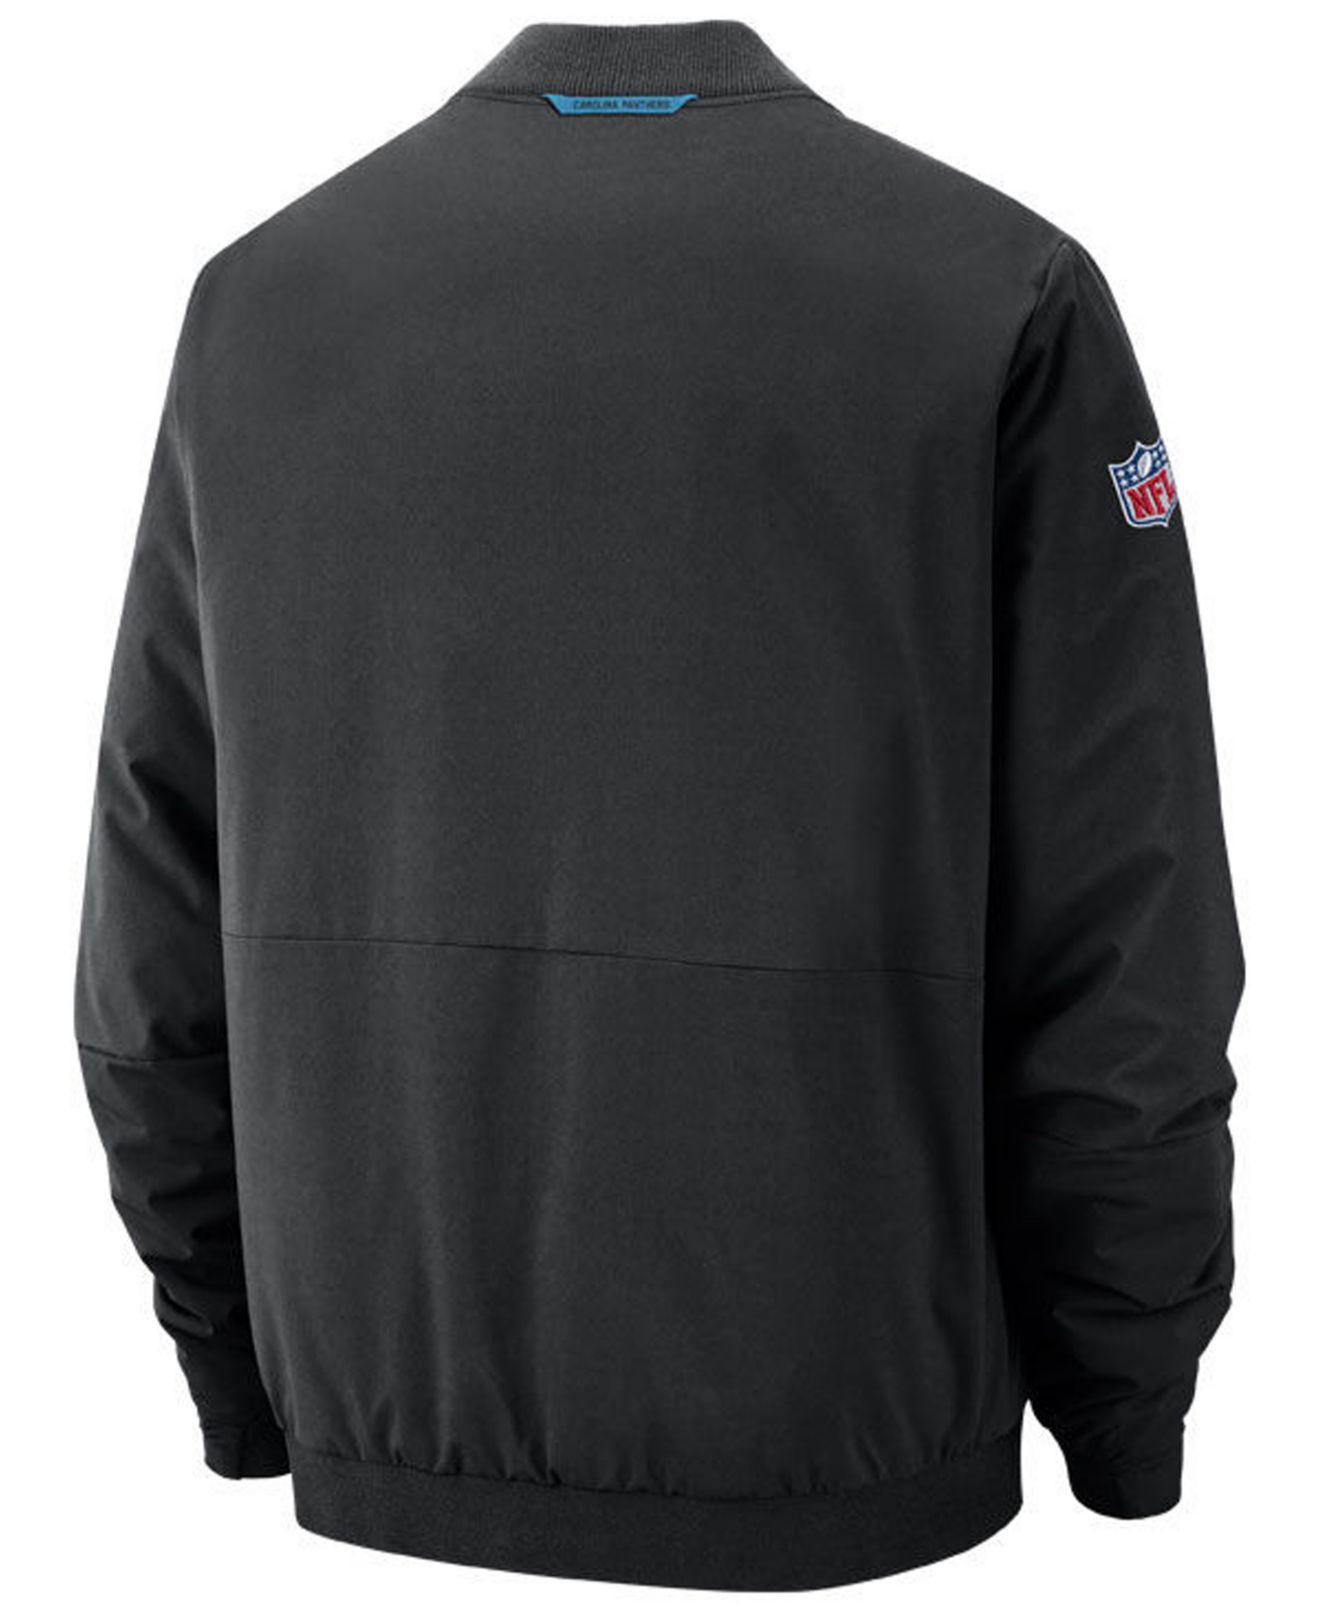 89f8312a8 Lyst - Nike Carolina Panthers Bomber Jacket in Black for Men